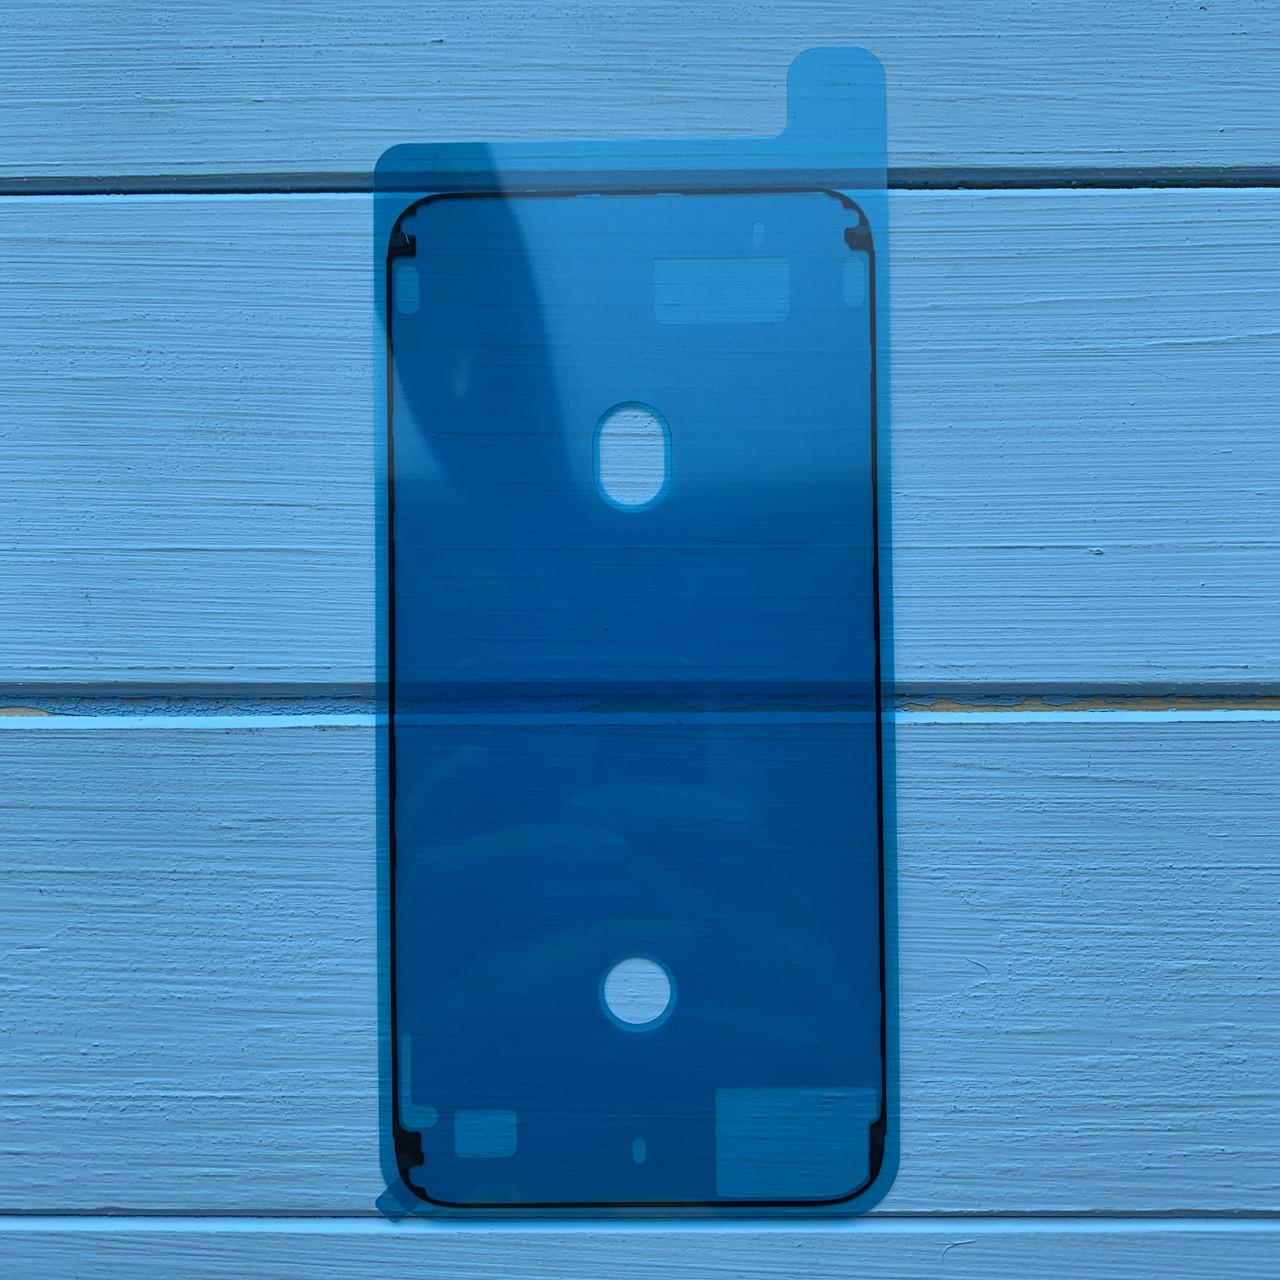 Стикер-проклейка (двухсторонний скотч) дисплея Apple iPhone 7 Plus Black